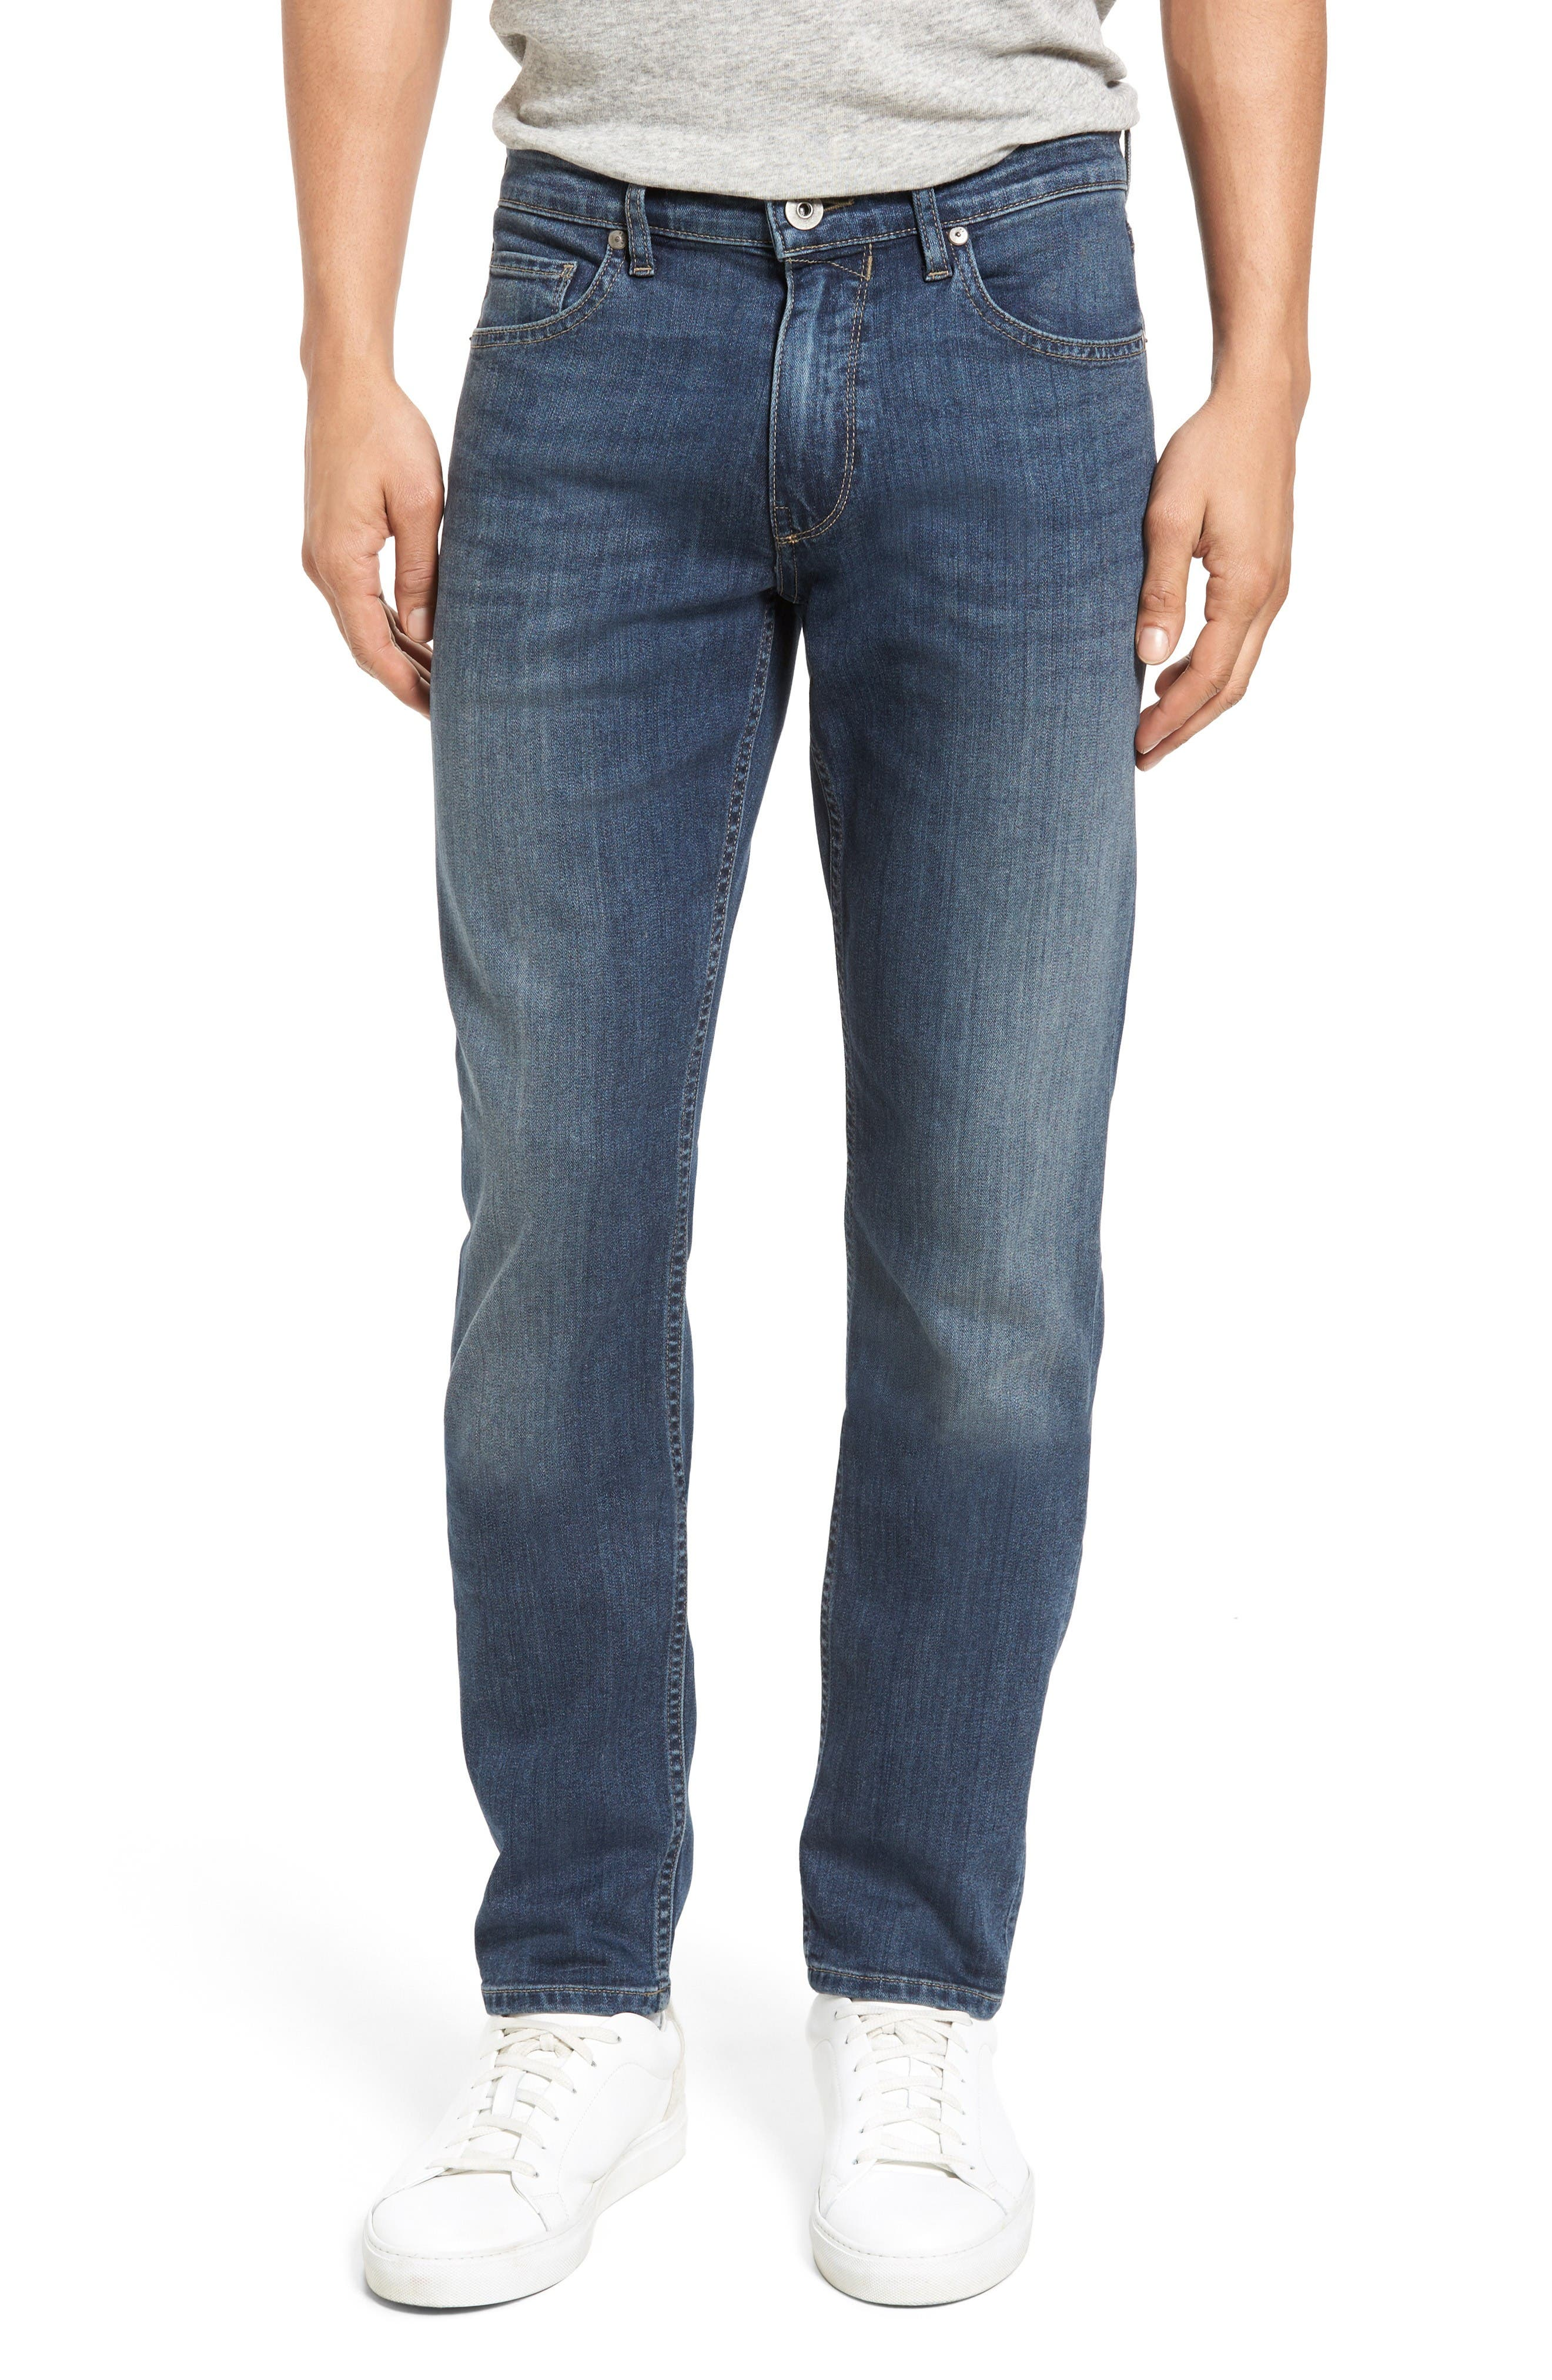 Transcend - Lennox Slim Fit Jeans,                             Main thumbnail 1, color,                             Elwood